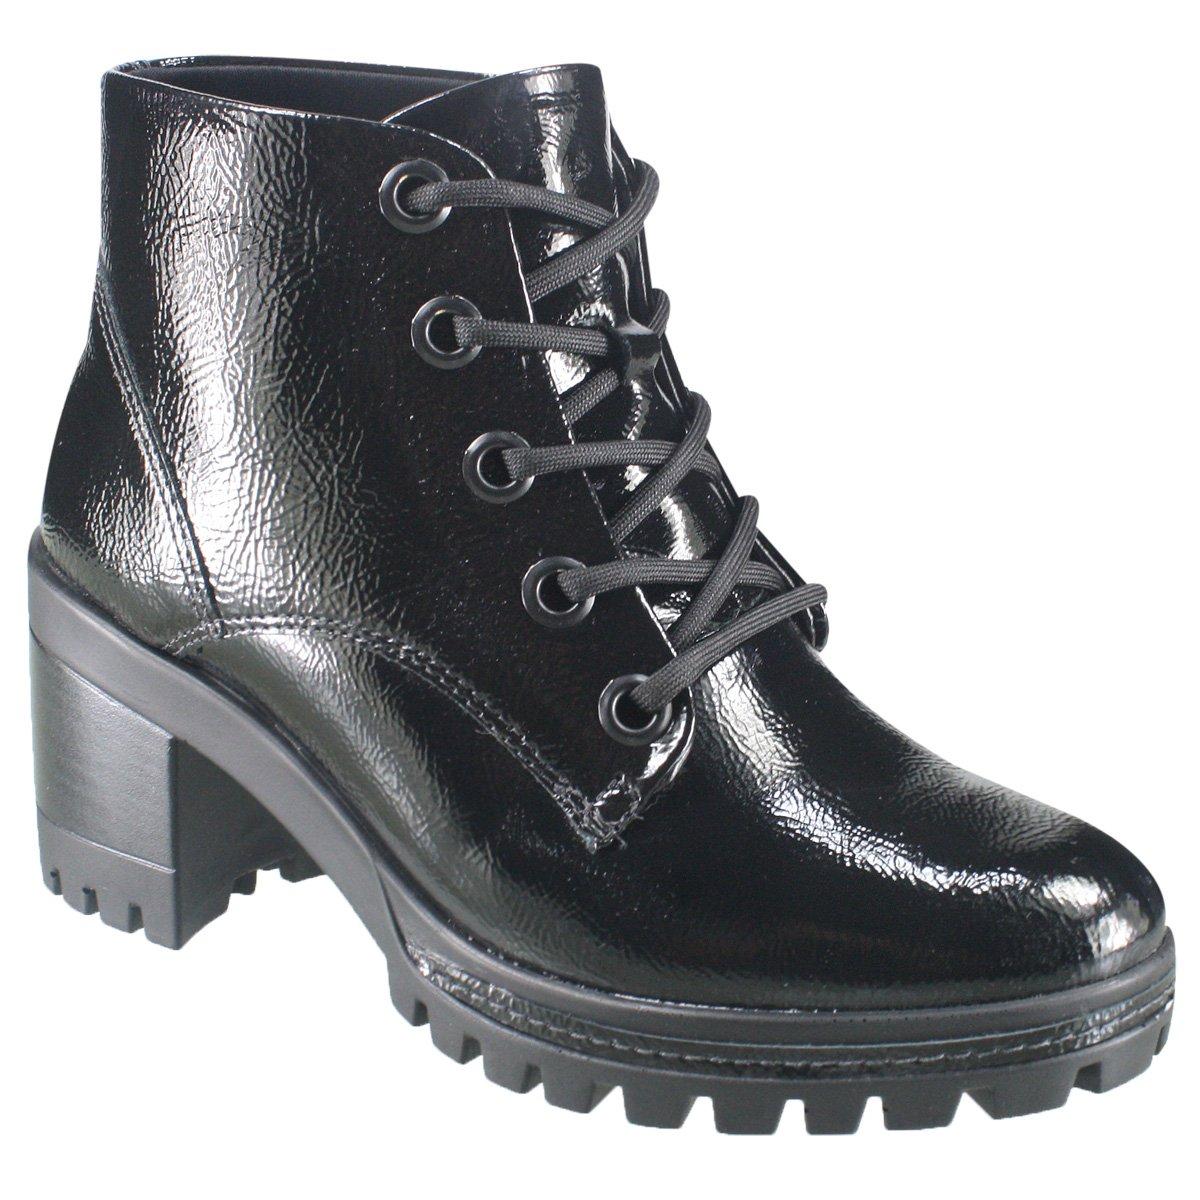 62c0b82428f Bota Ramarim Ankle Boot 18-50102 - Preto (Verniz Show Plus) - Botas ...